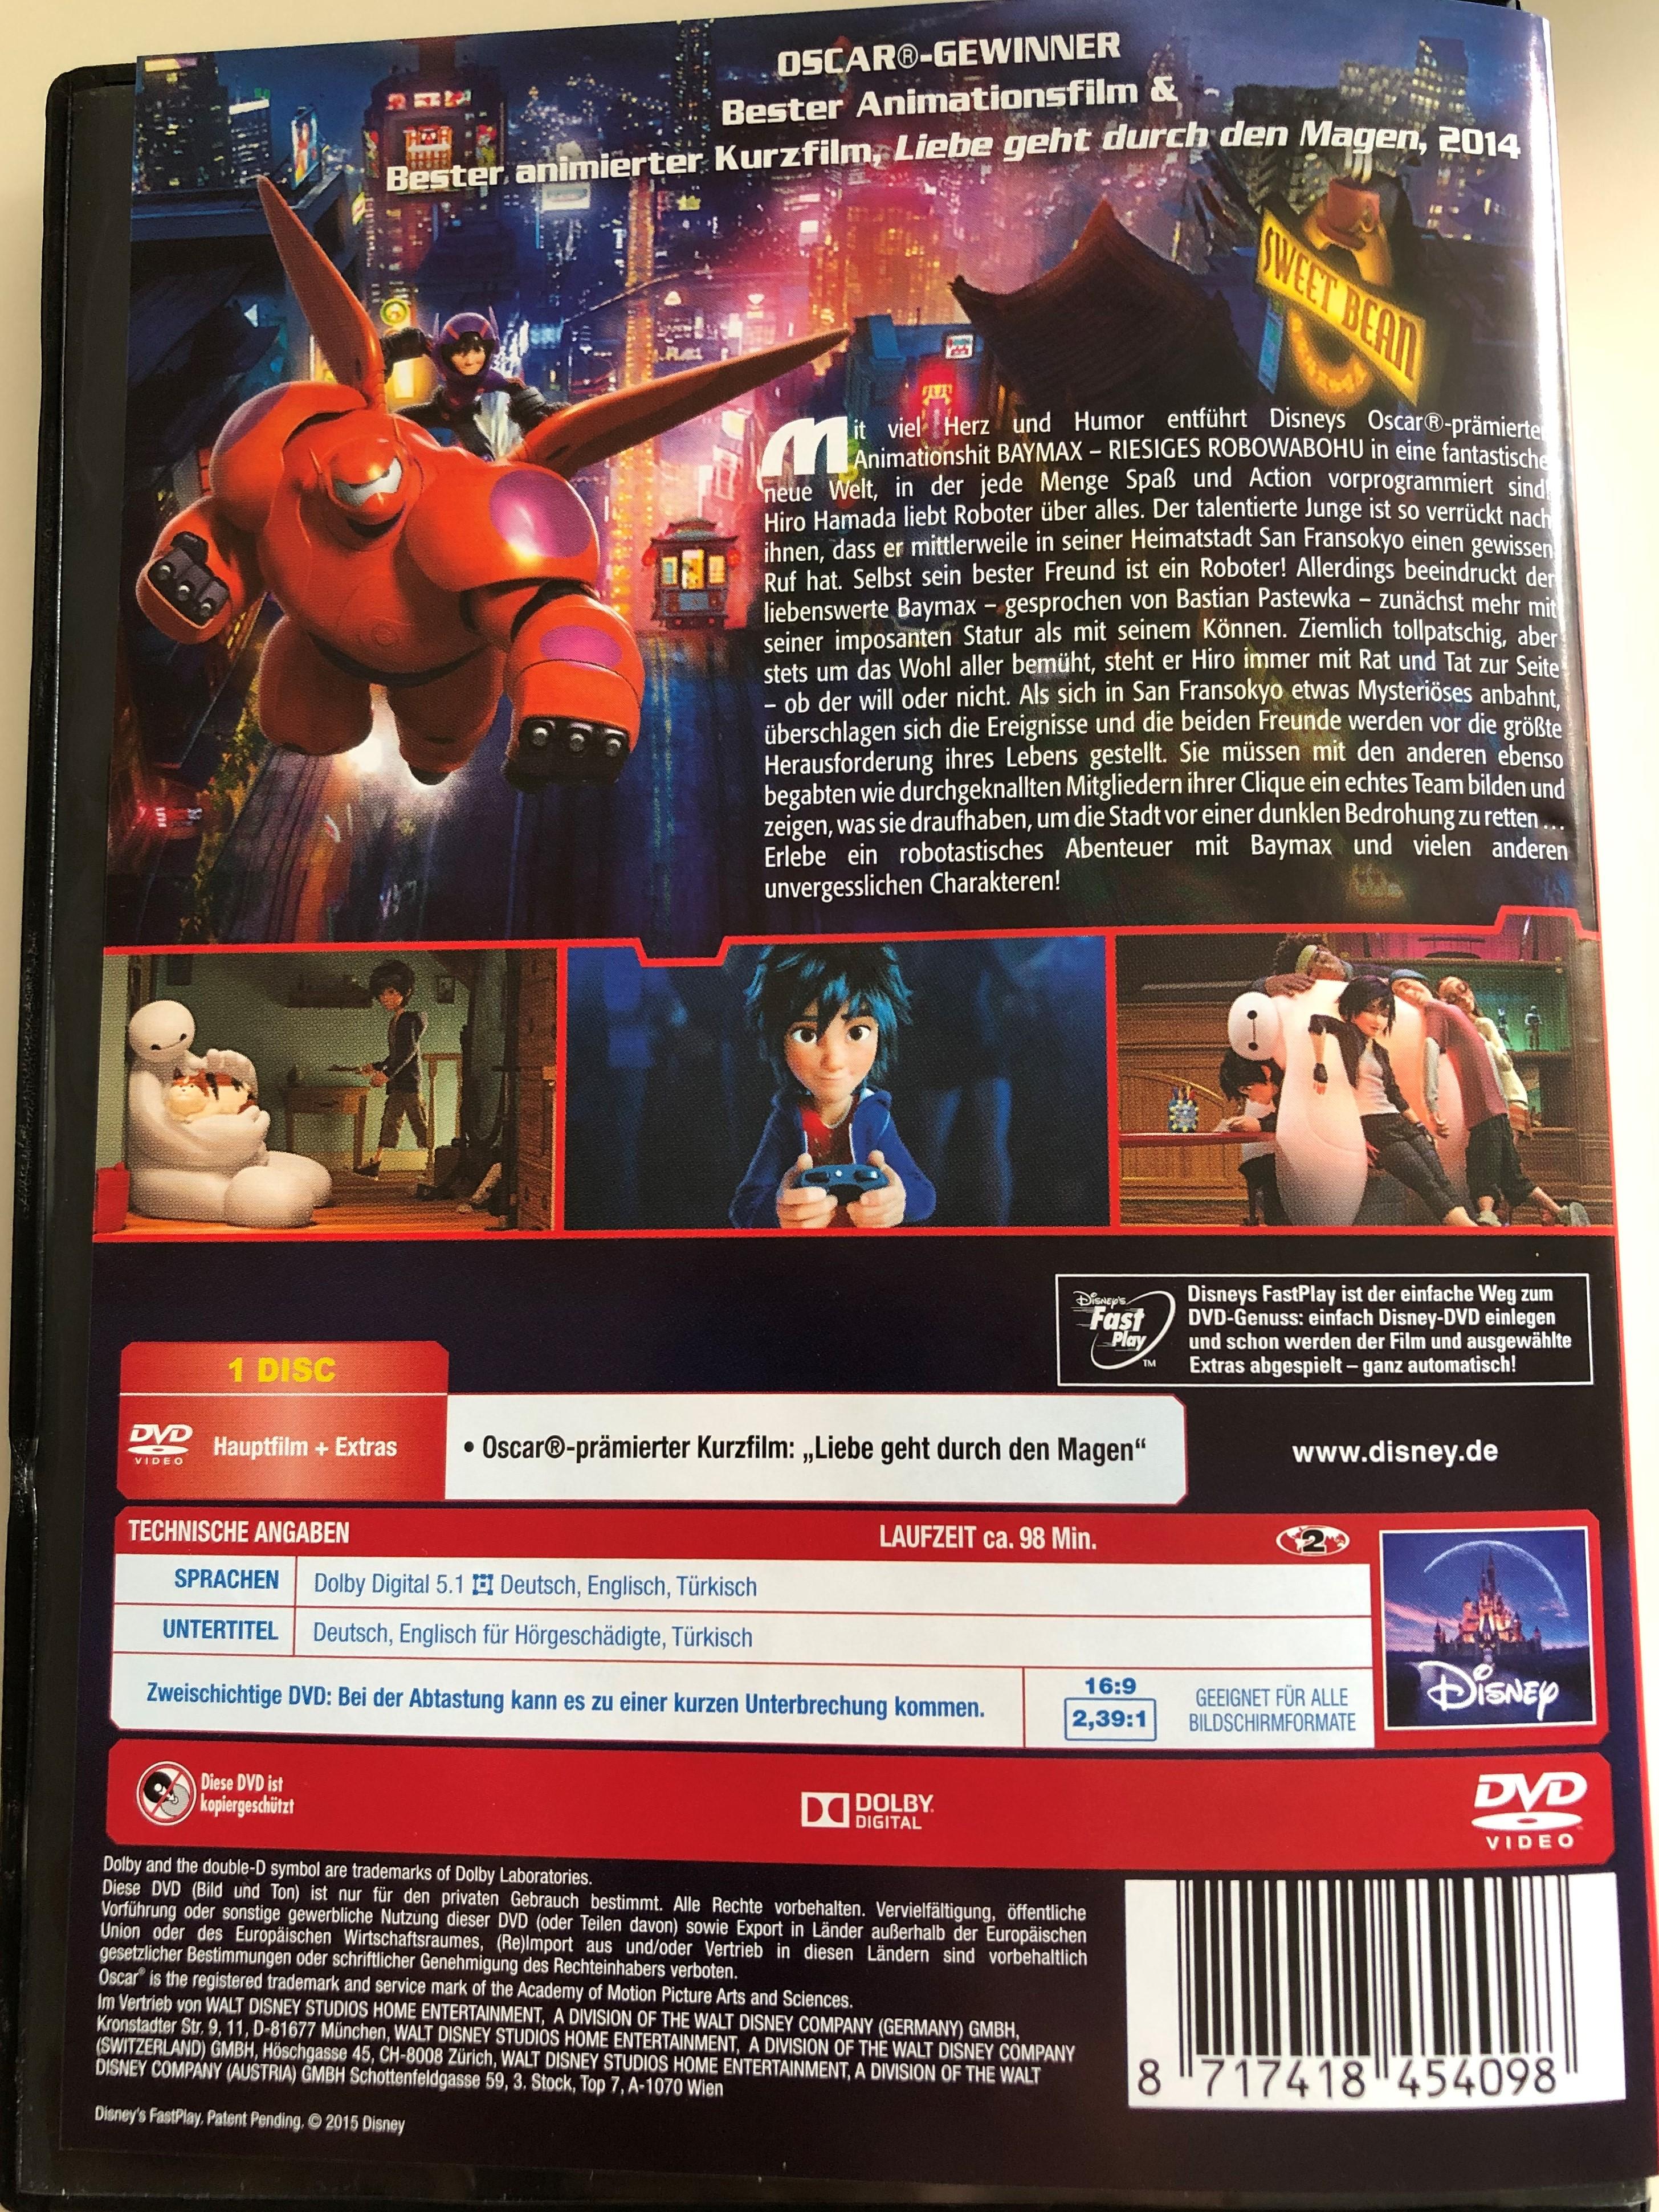 big-hero-6-dvd-2014-baymax-reisiges-robowabohu-directed-by-don-hall-chris-williams-starring-ryan-potter-scott-adsit-daniel-henney-t.j.-miller-jamie-chung-damon-wayans-jr.-genesis-rodriguez-james.jpg